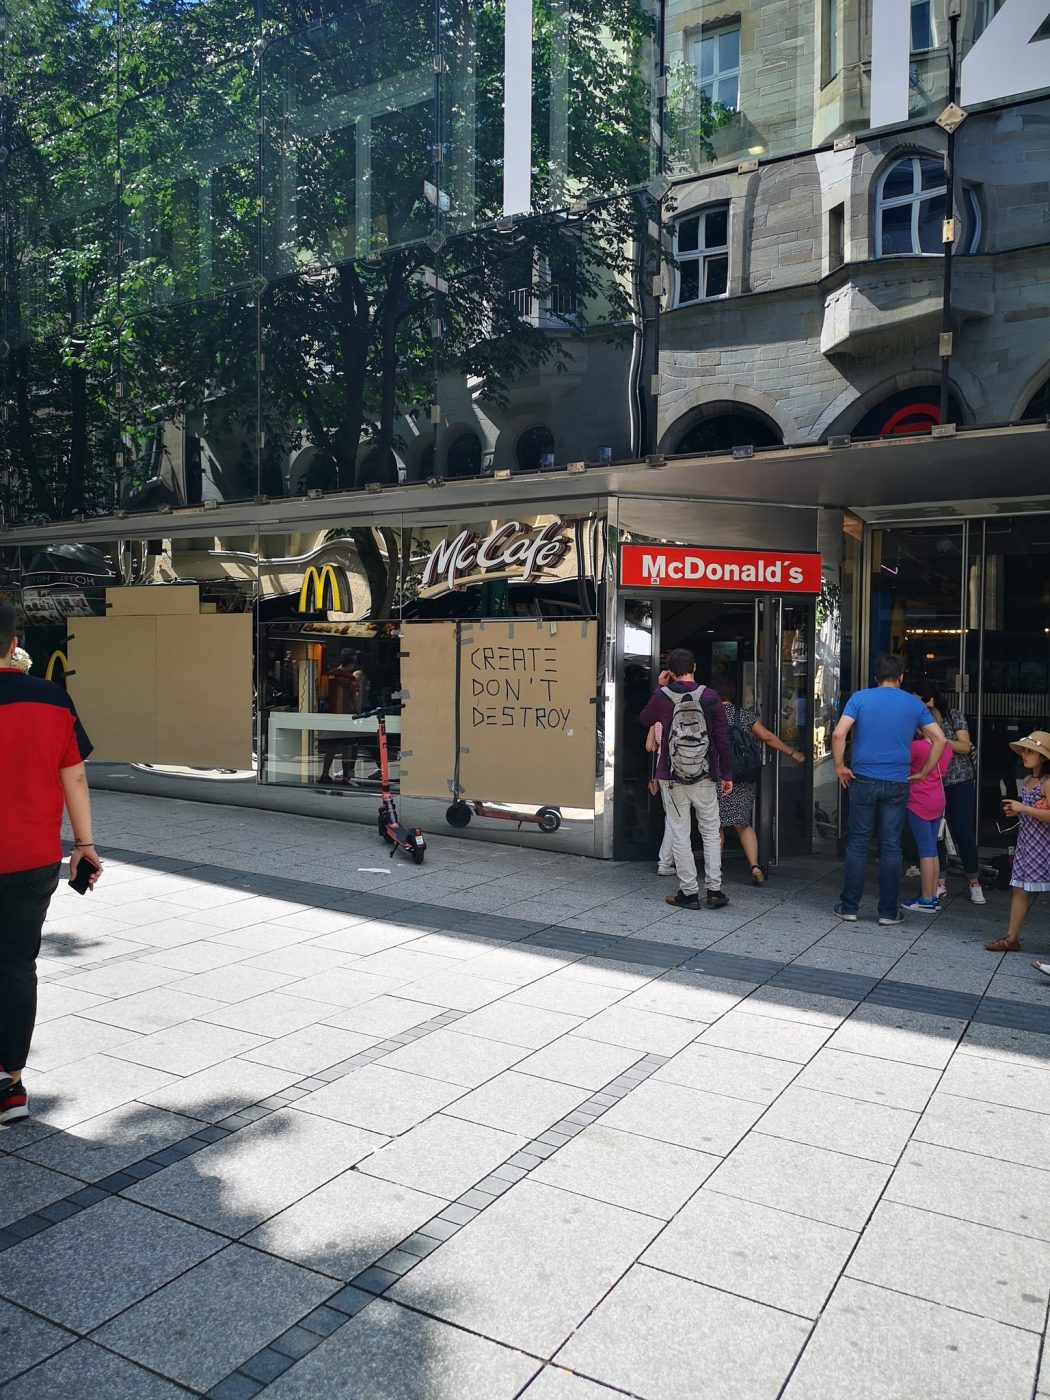 Stuttgart Randale Täter